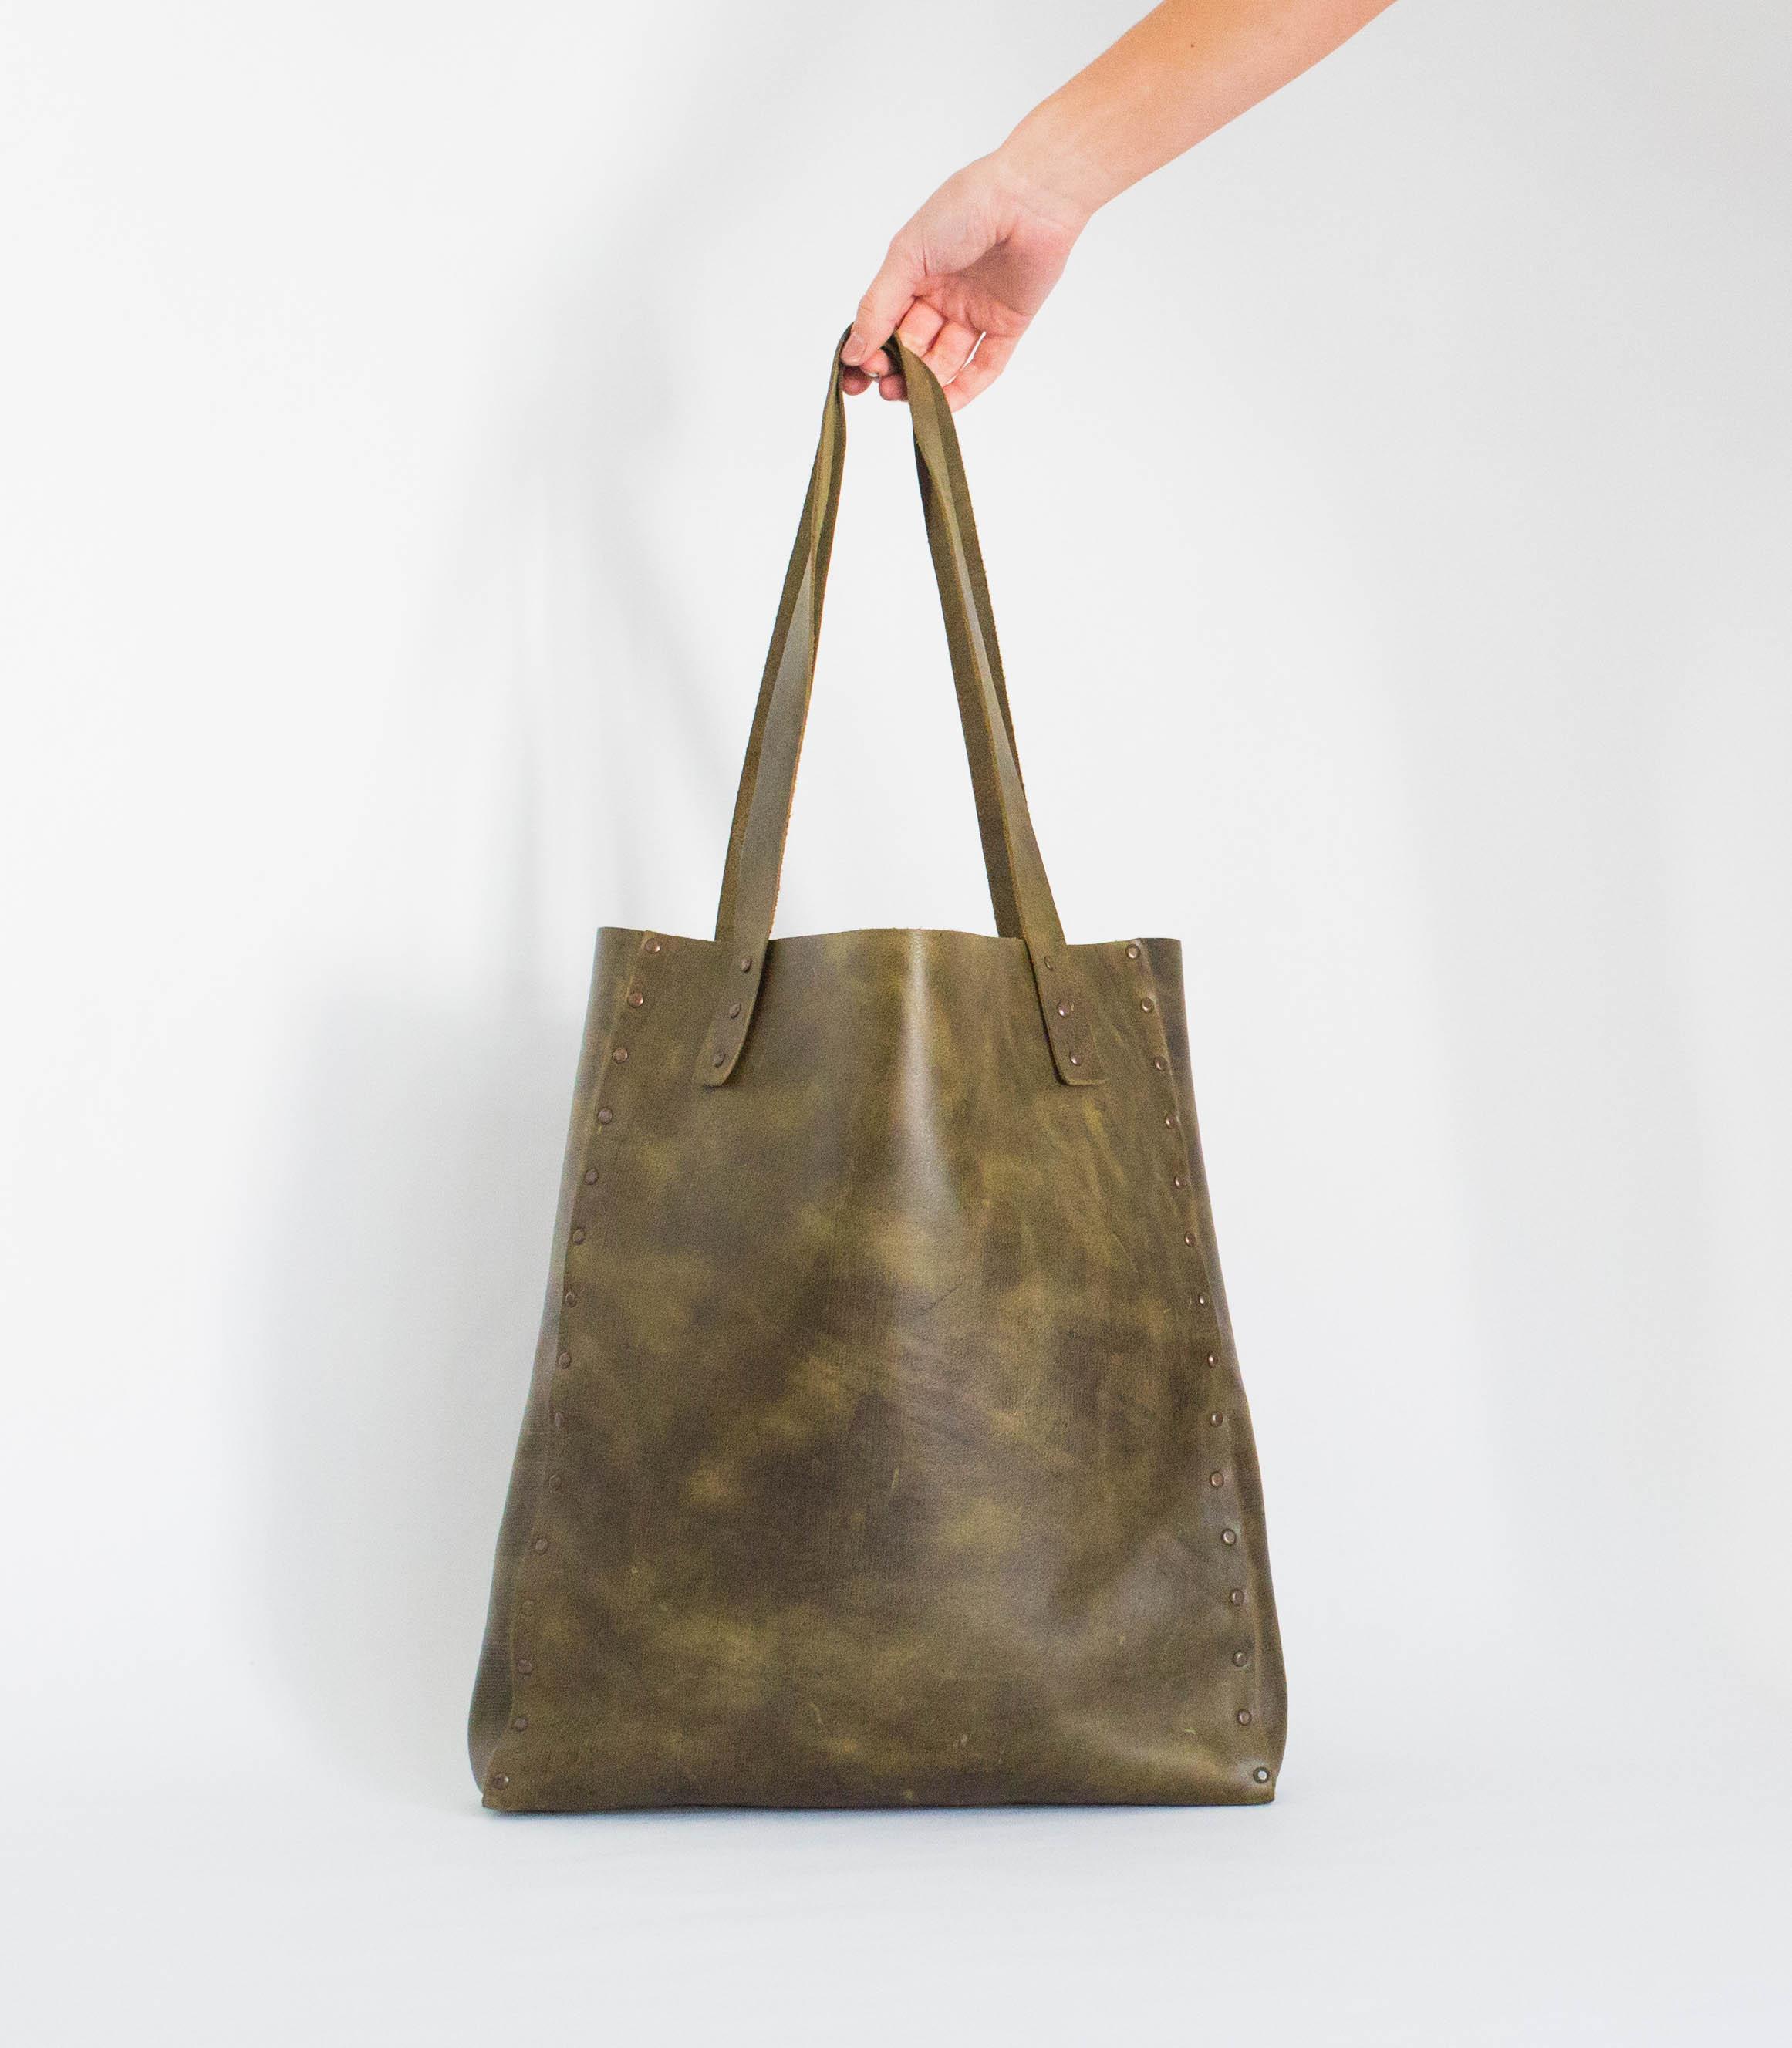 Hazlo Handmade Guatemala Fair Trade Hand Woven Leather Bags Accessories Belts Antigua Slow Fashion Purse Jewelry1768.jpg